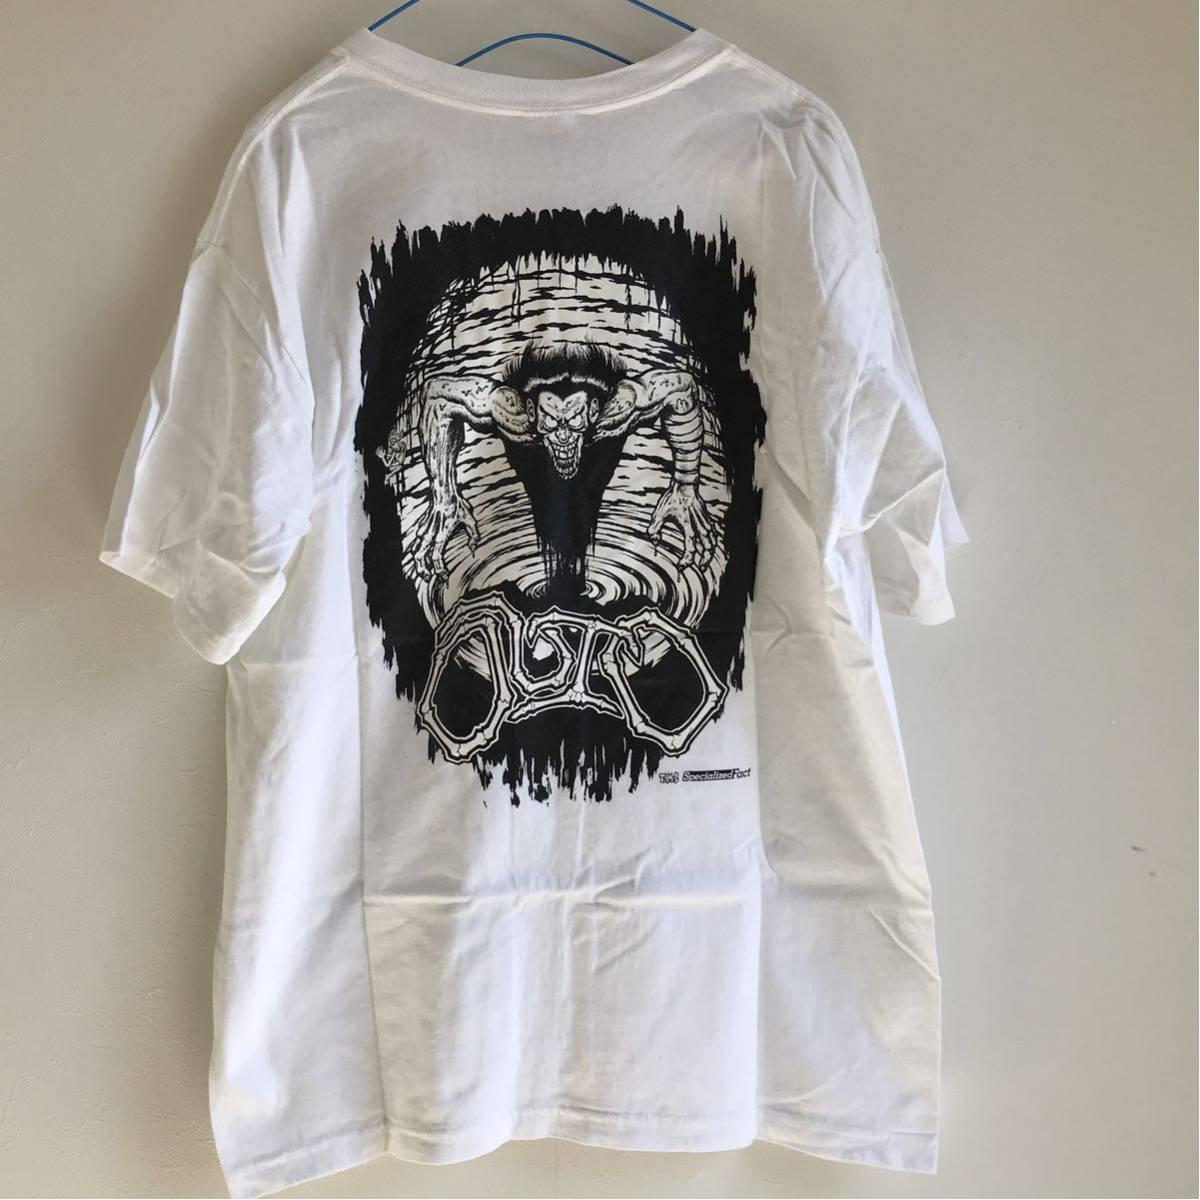 OUTO Tシャツ (検索 S.O.B. LIP cream リップクリーム )